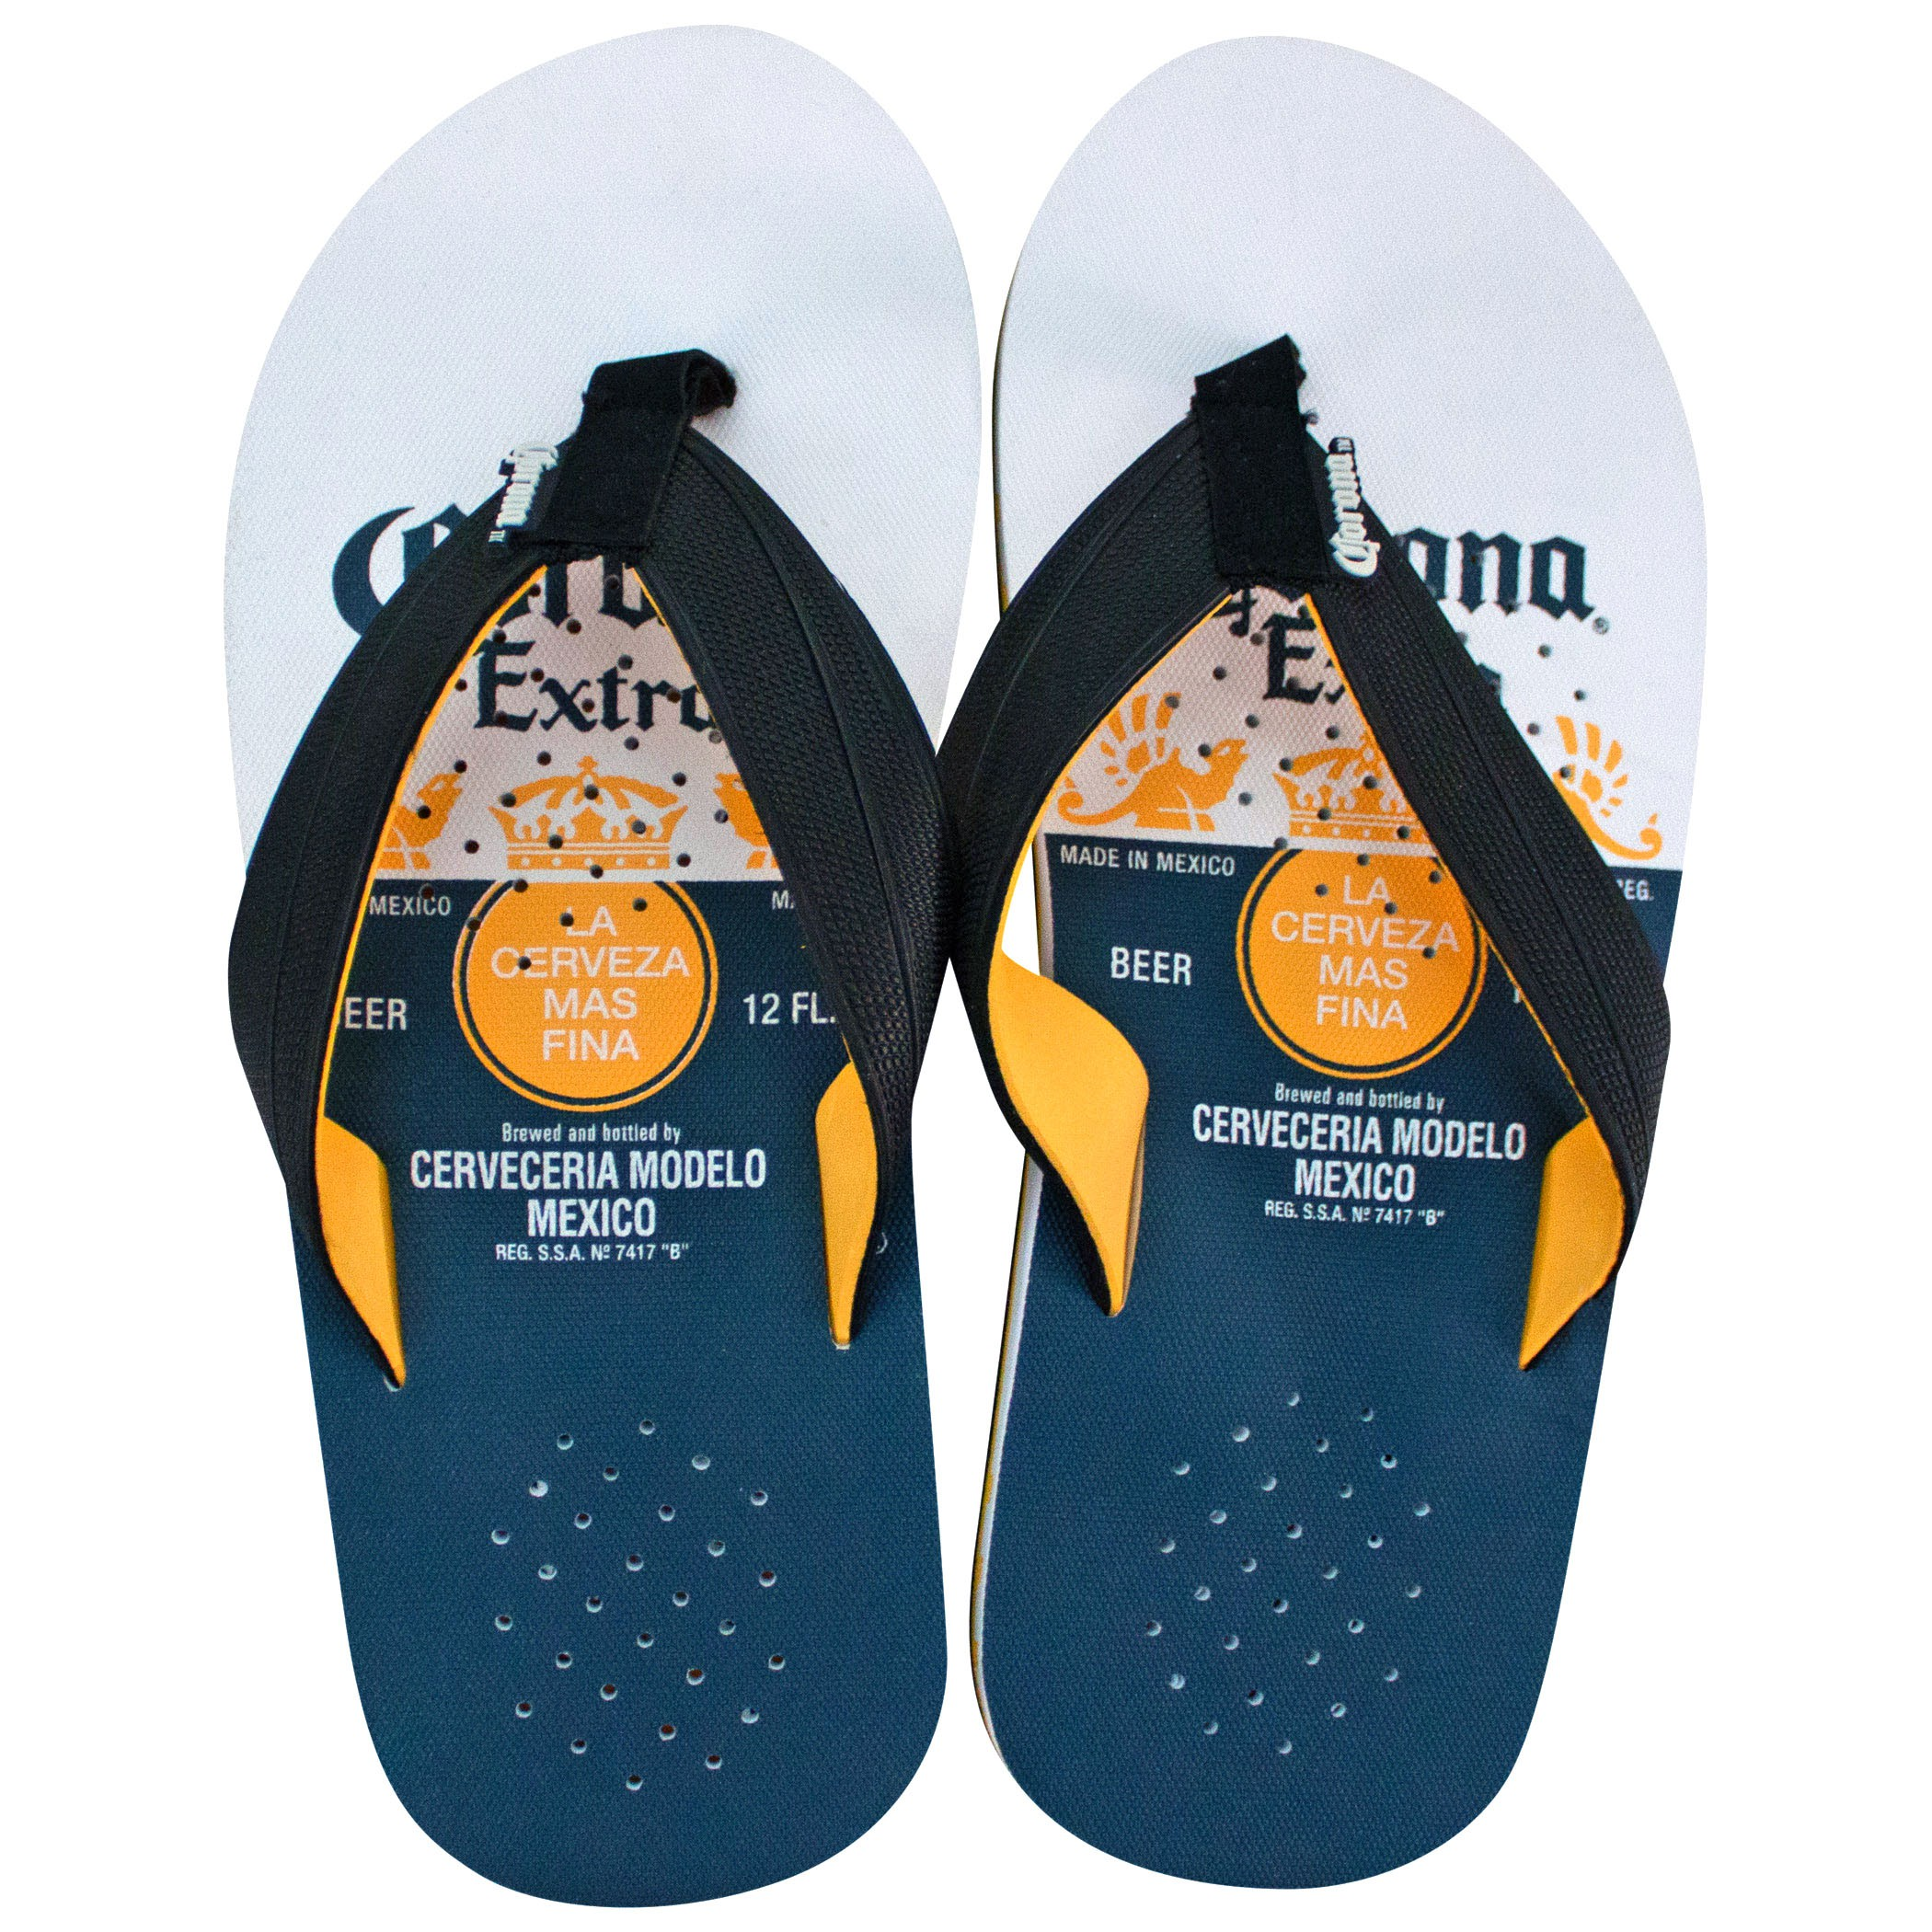 Corona Extra Bottle Label Blue And White Sandals